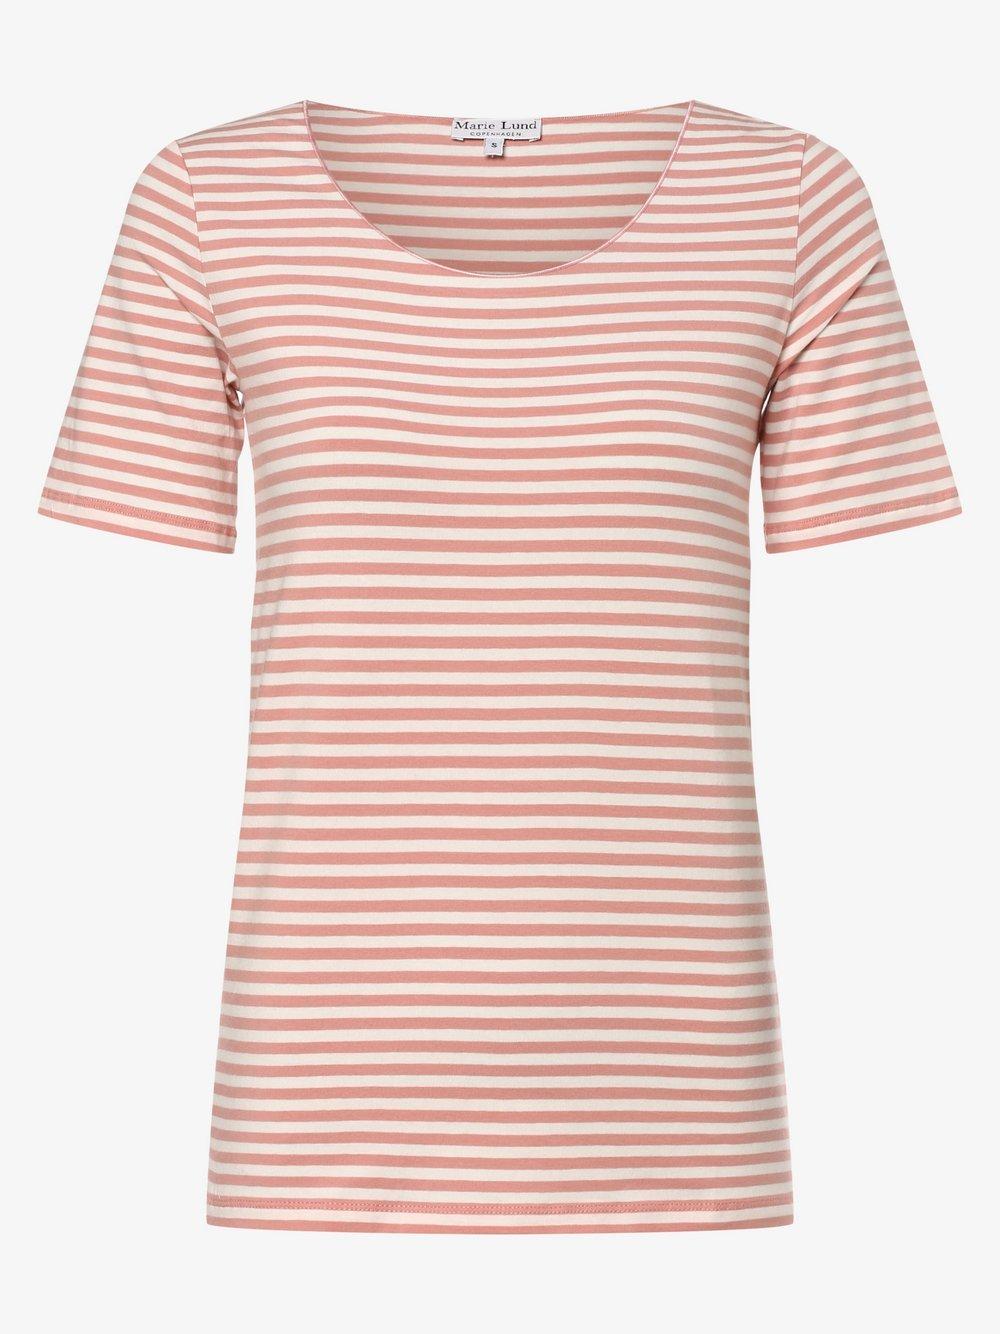 Marie Lund - T-shirt damski, różowy